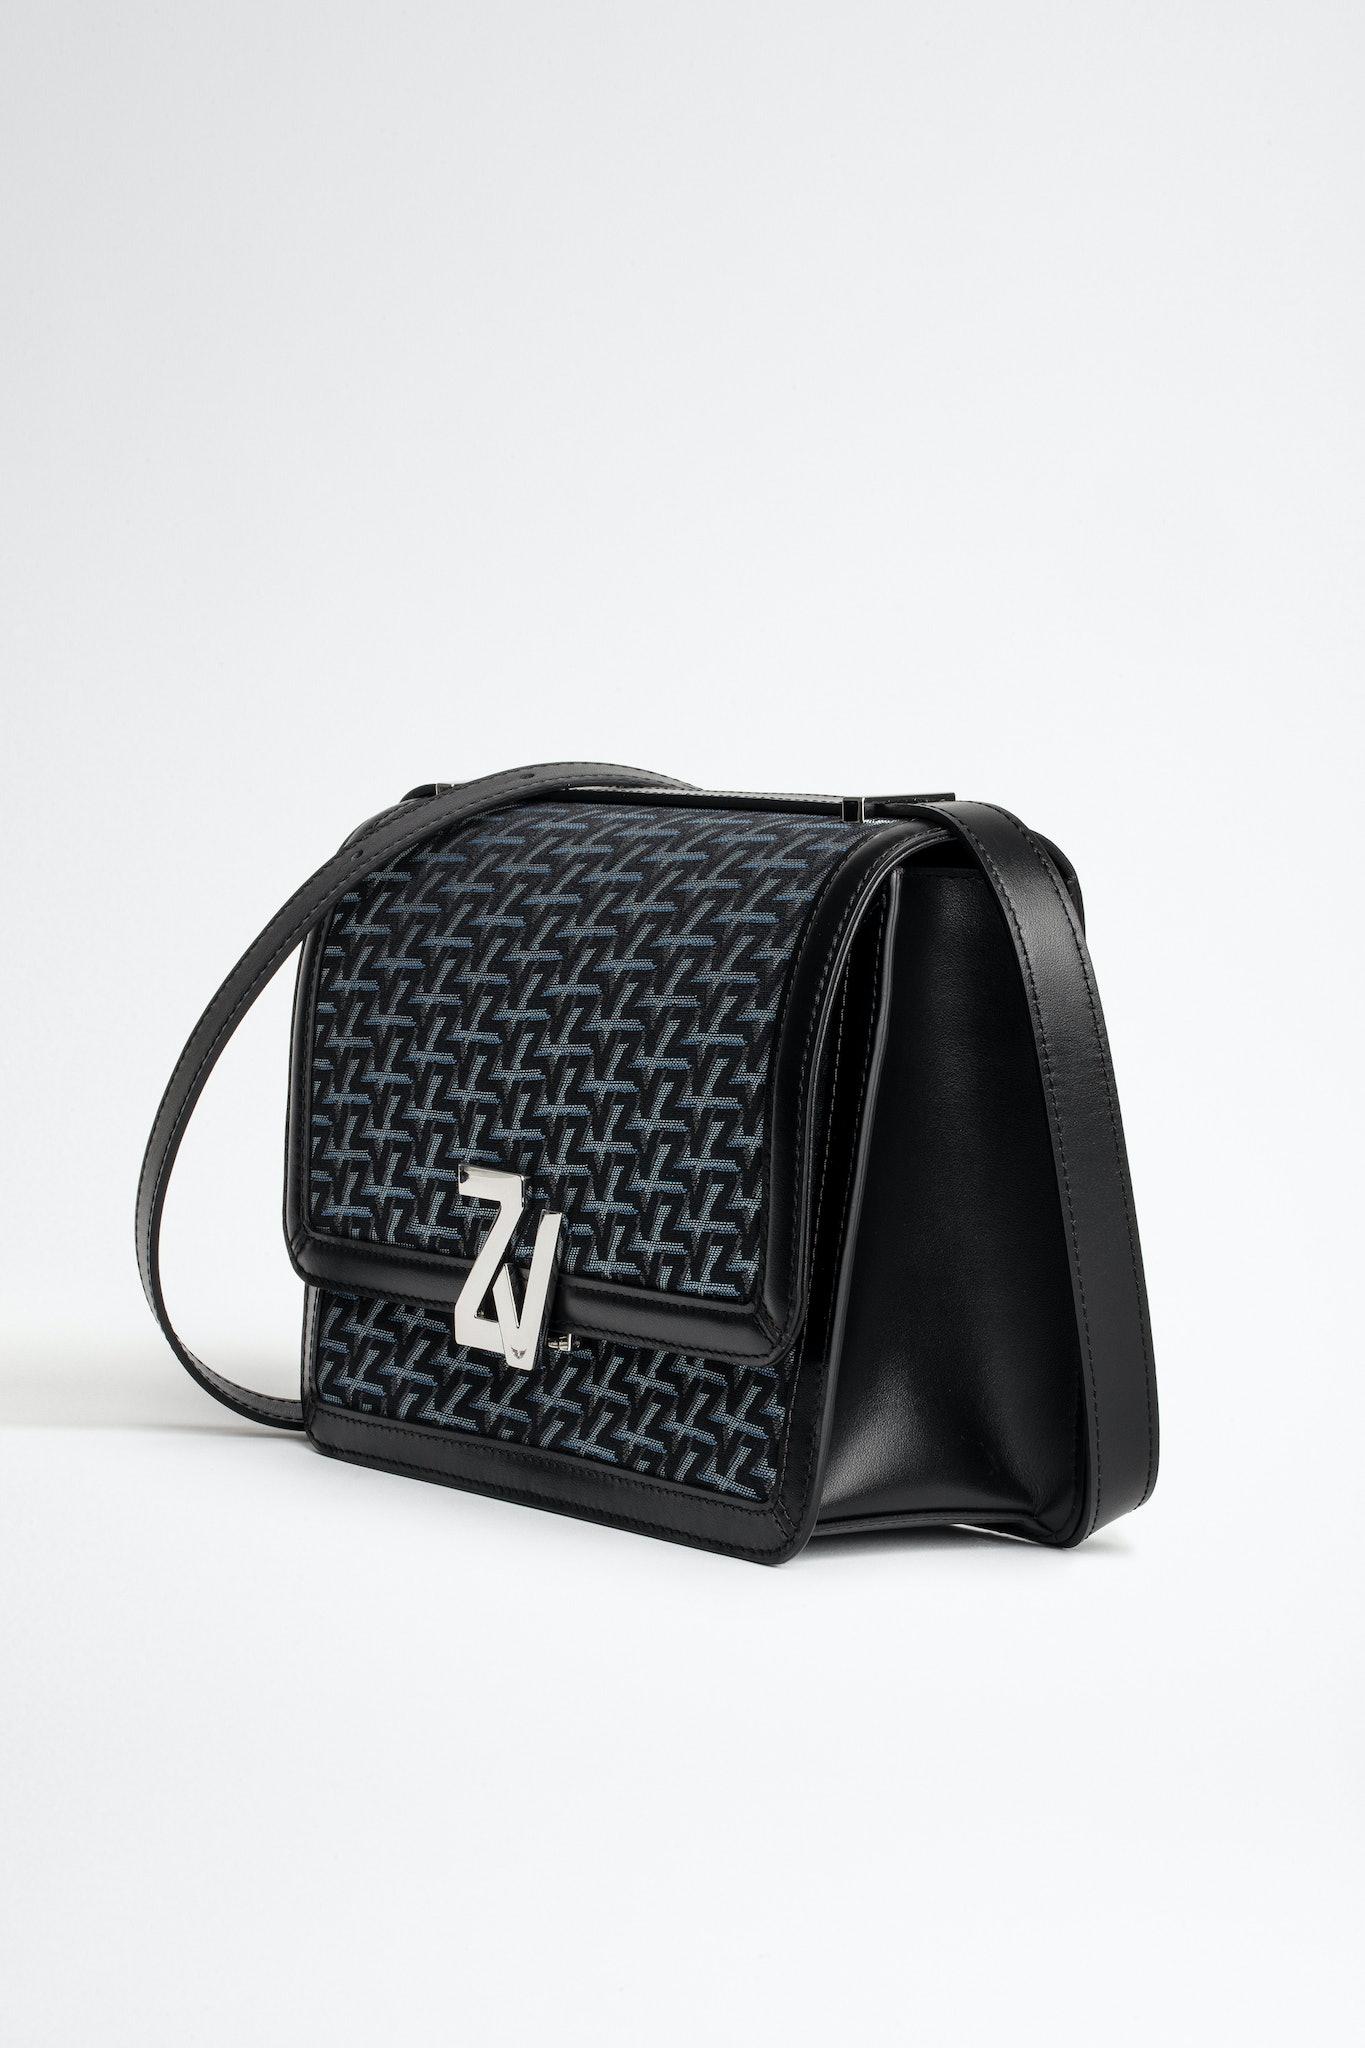 ZV Initiale Le City Monogram Bag